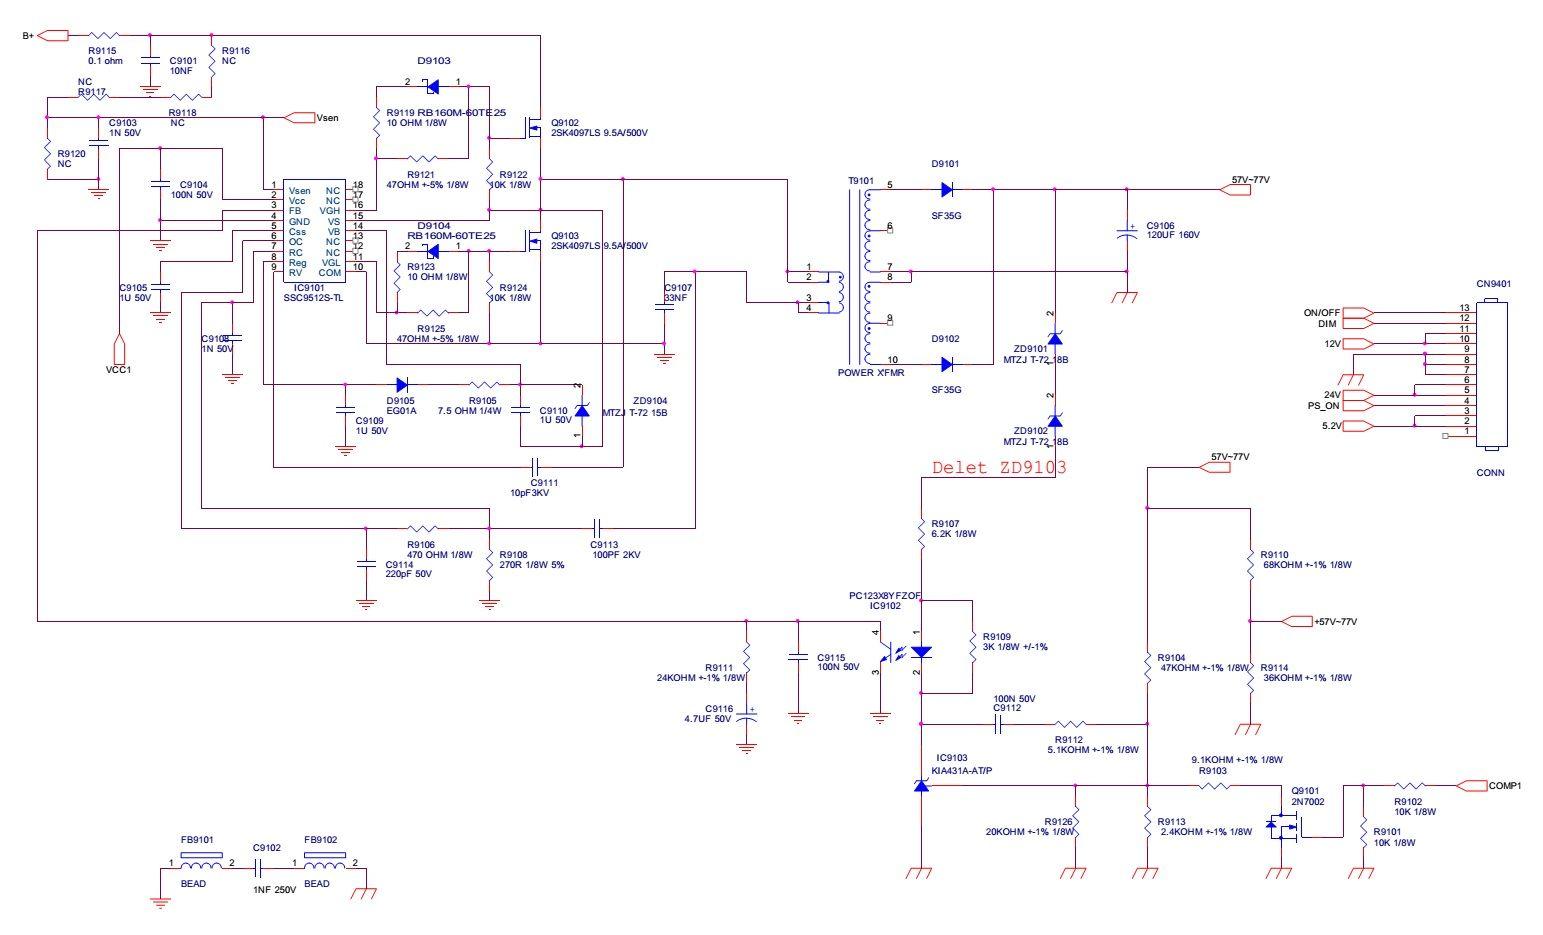 tv circuit board diagram repair haier tv circuit board diagrams  schematics  pdf service manuals  haier tv circuit board diagrams